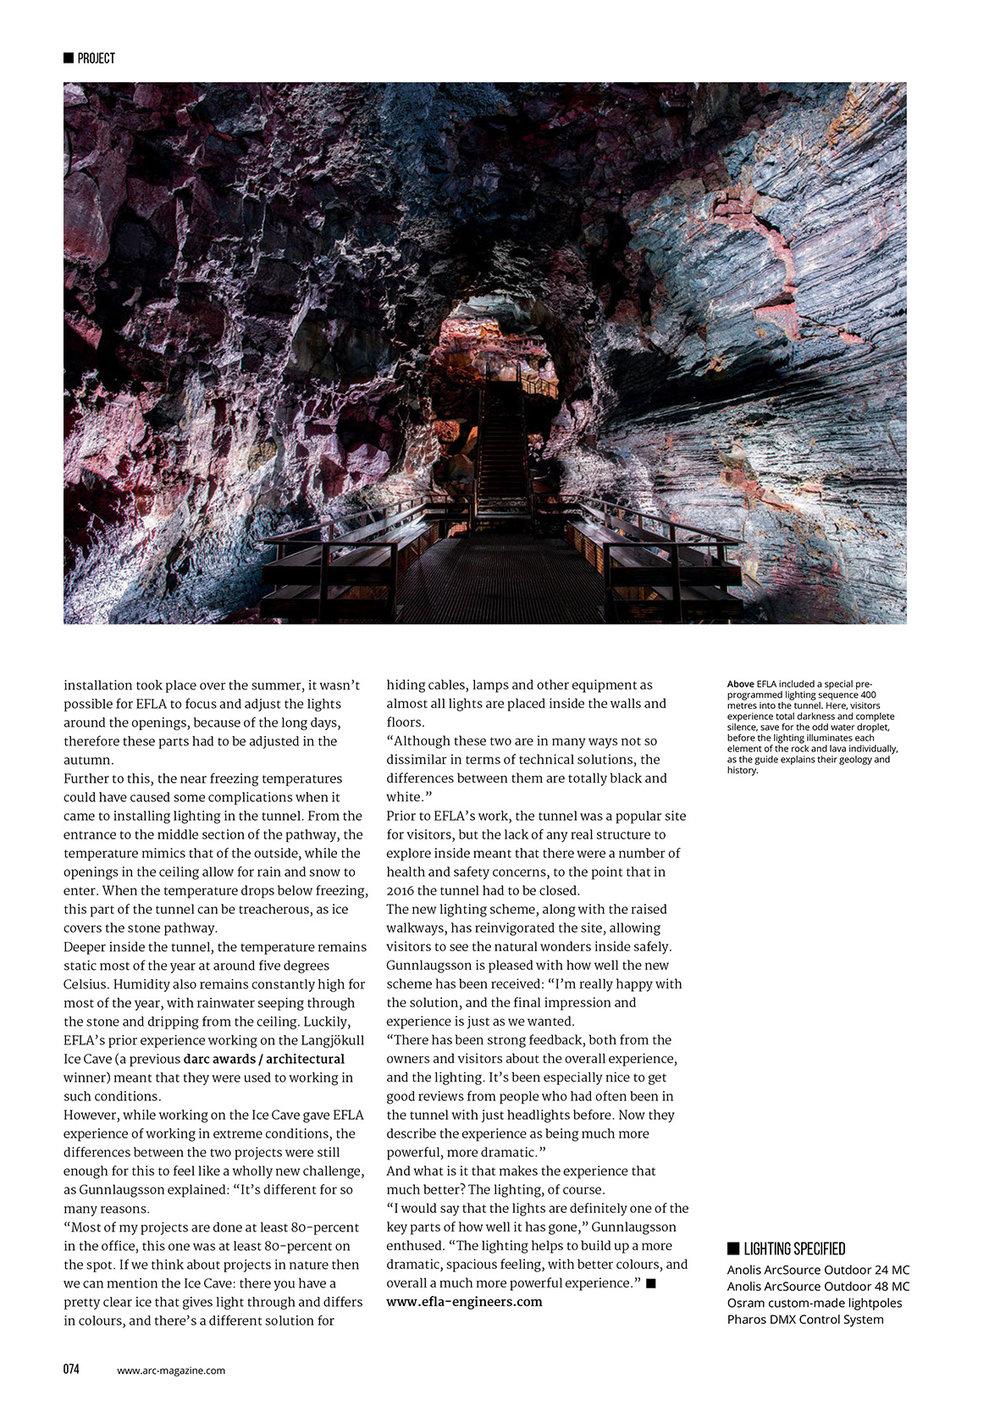 arc magazine_107_Lava Tunnel article_pp66-74 8w.jpg